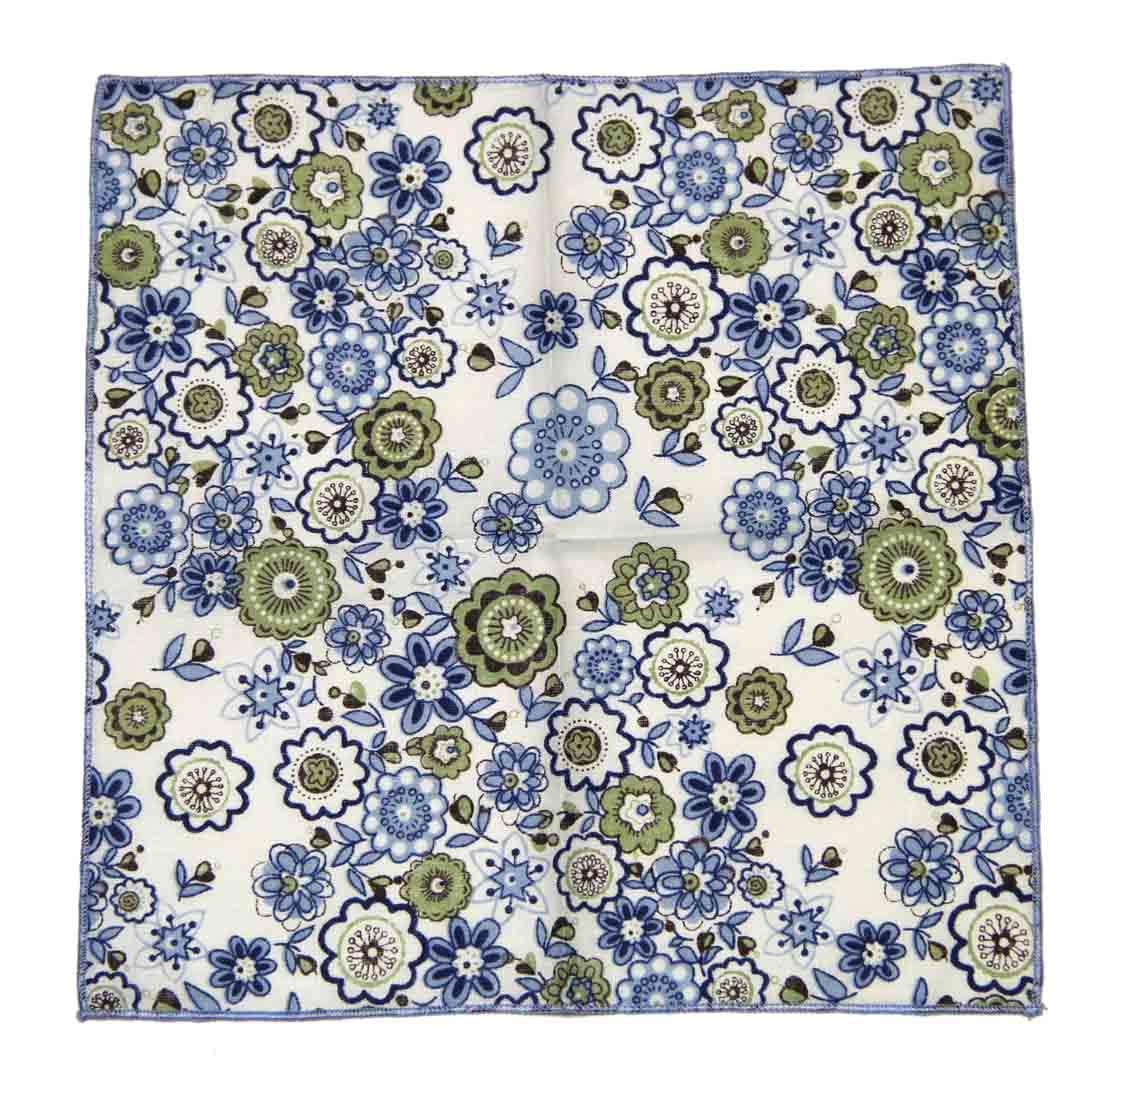 Gascoigne Pocket Square Floral White Navy Blue Brown Green Men's